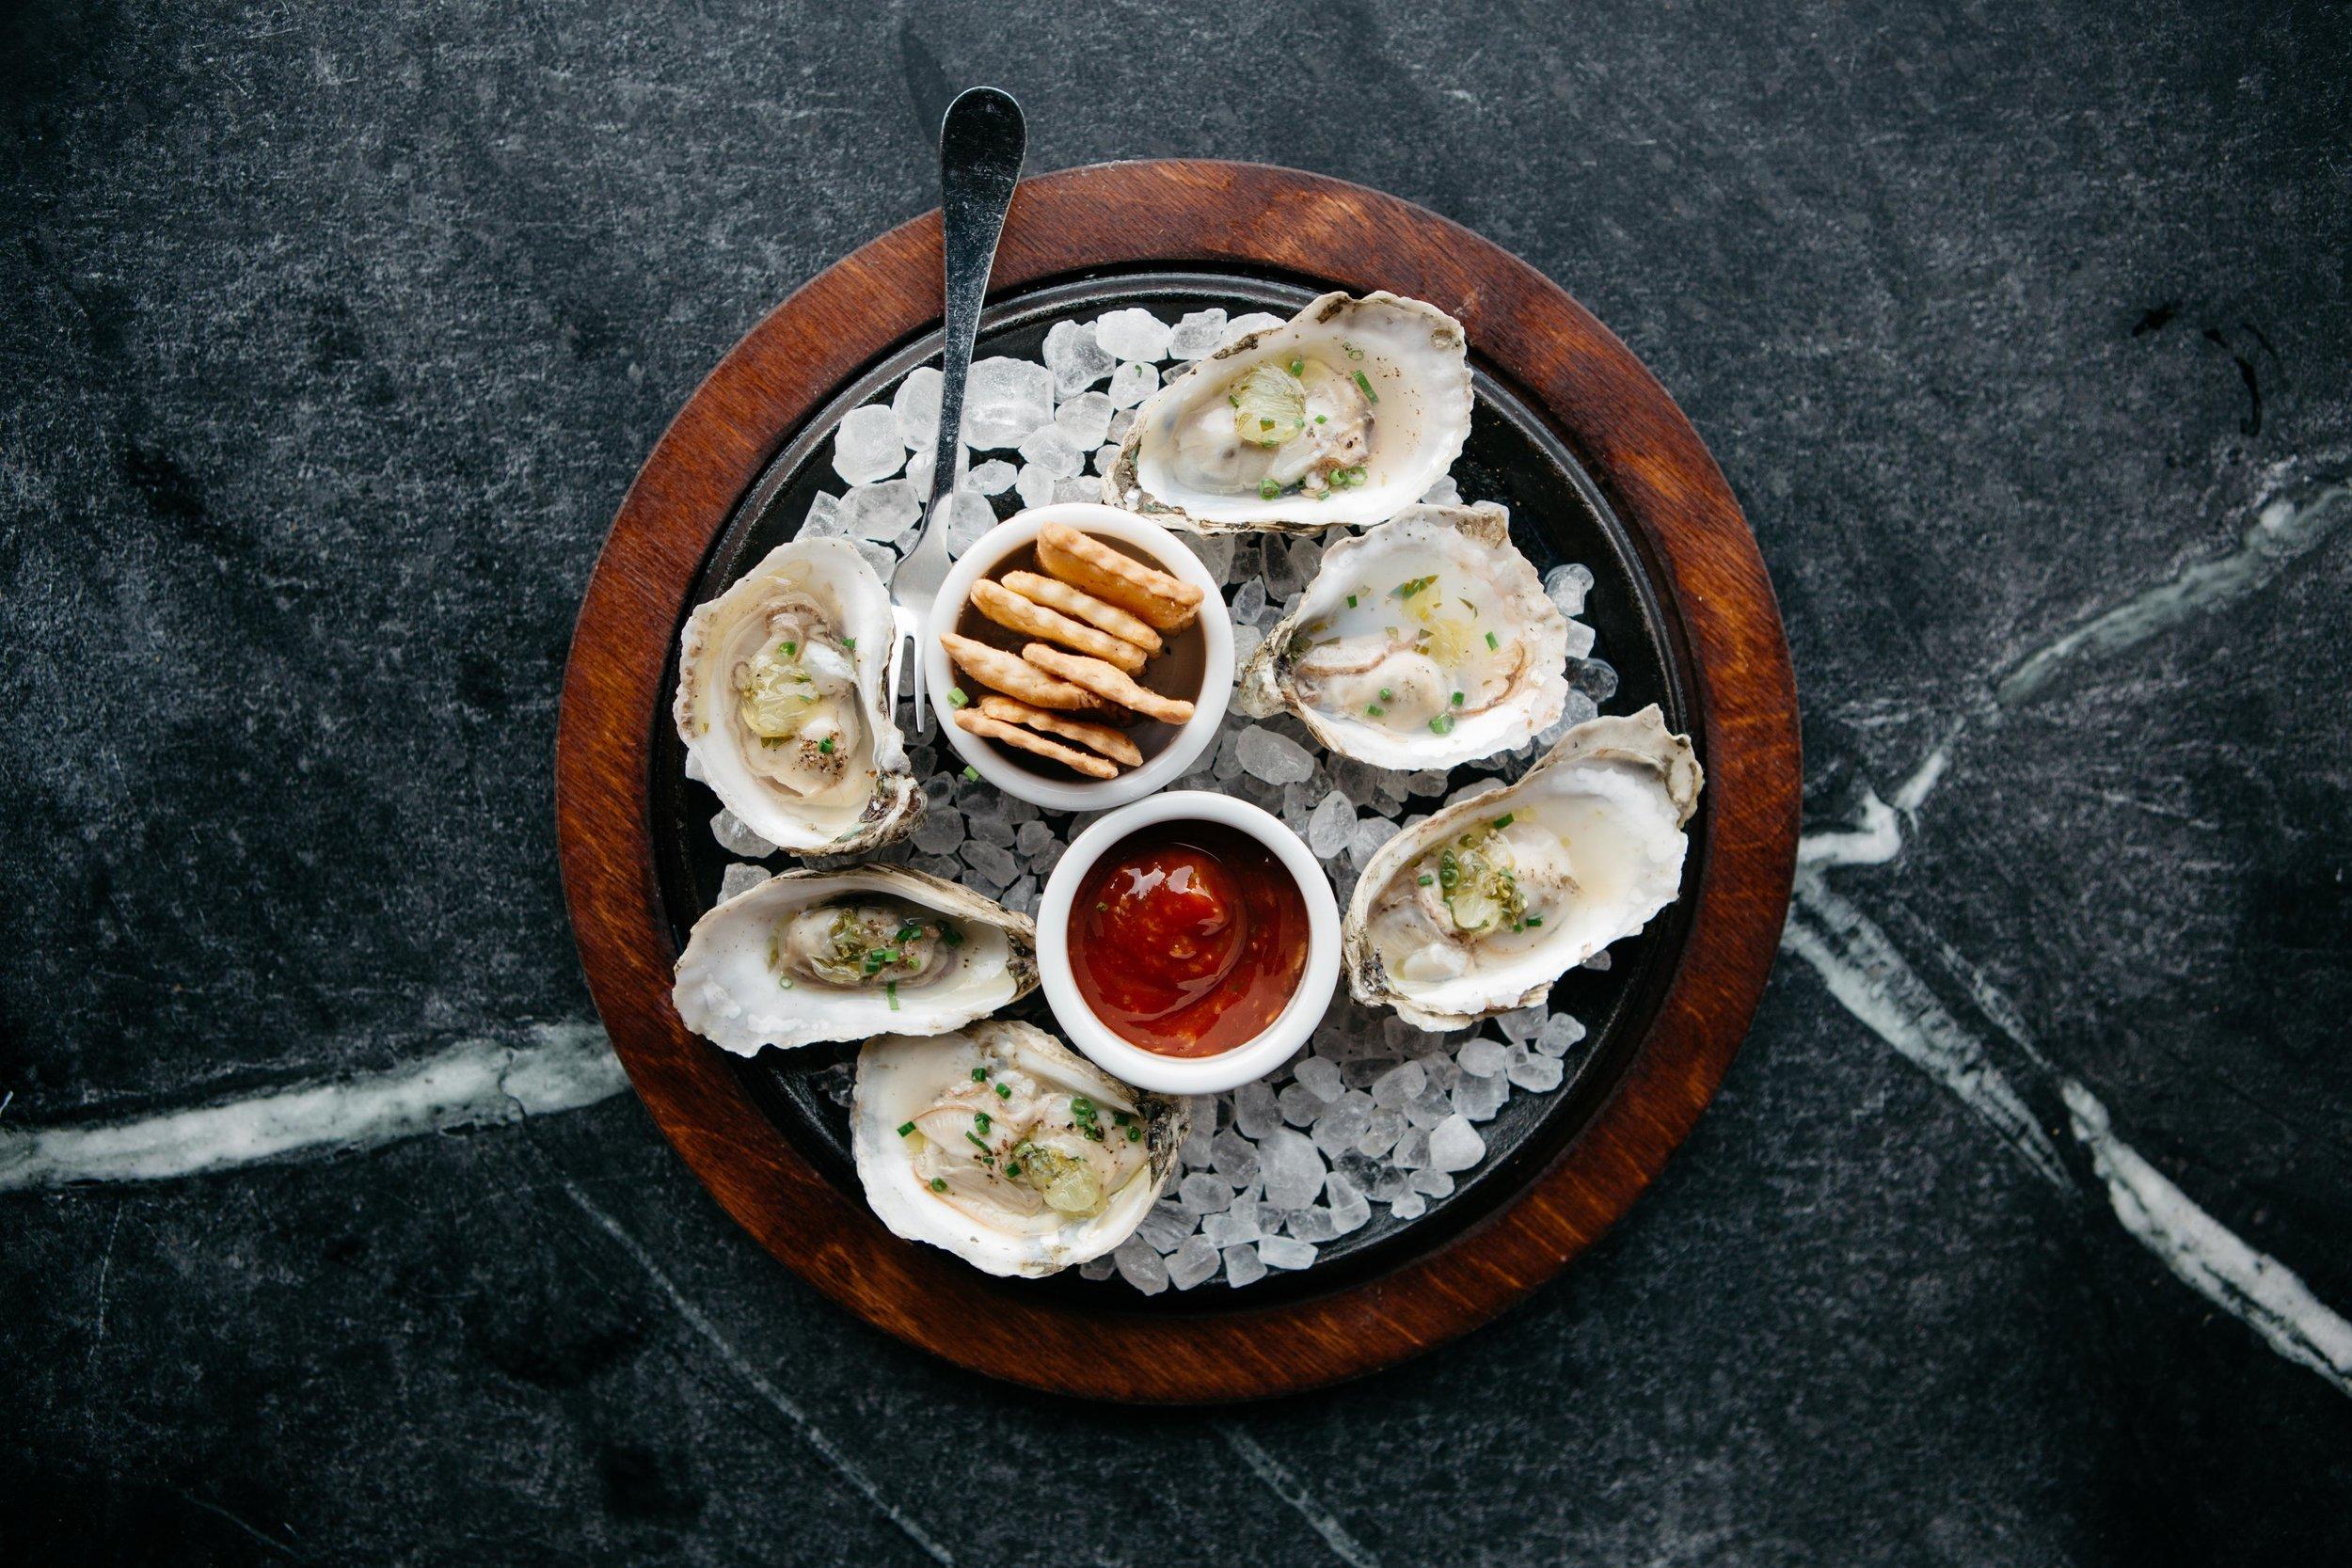 PatrickMichaelChin_5thandTaylor_Oysters_Food.jpg